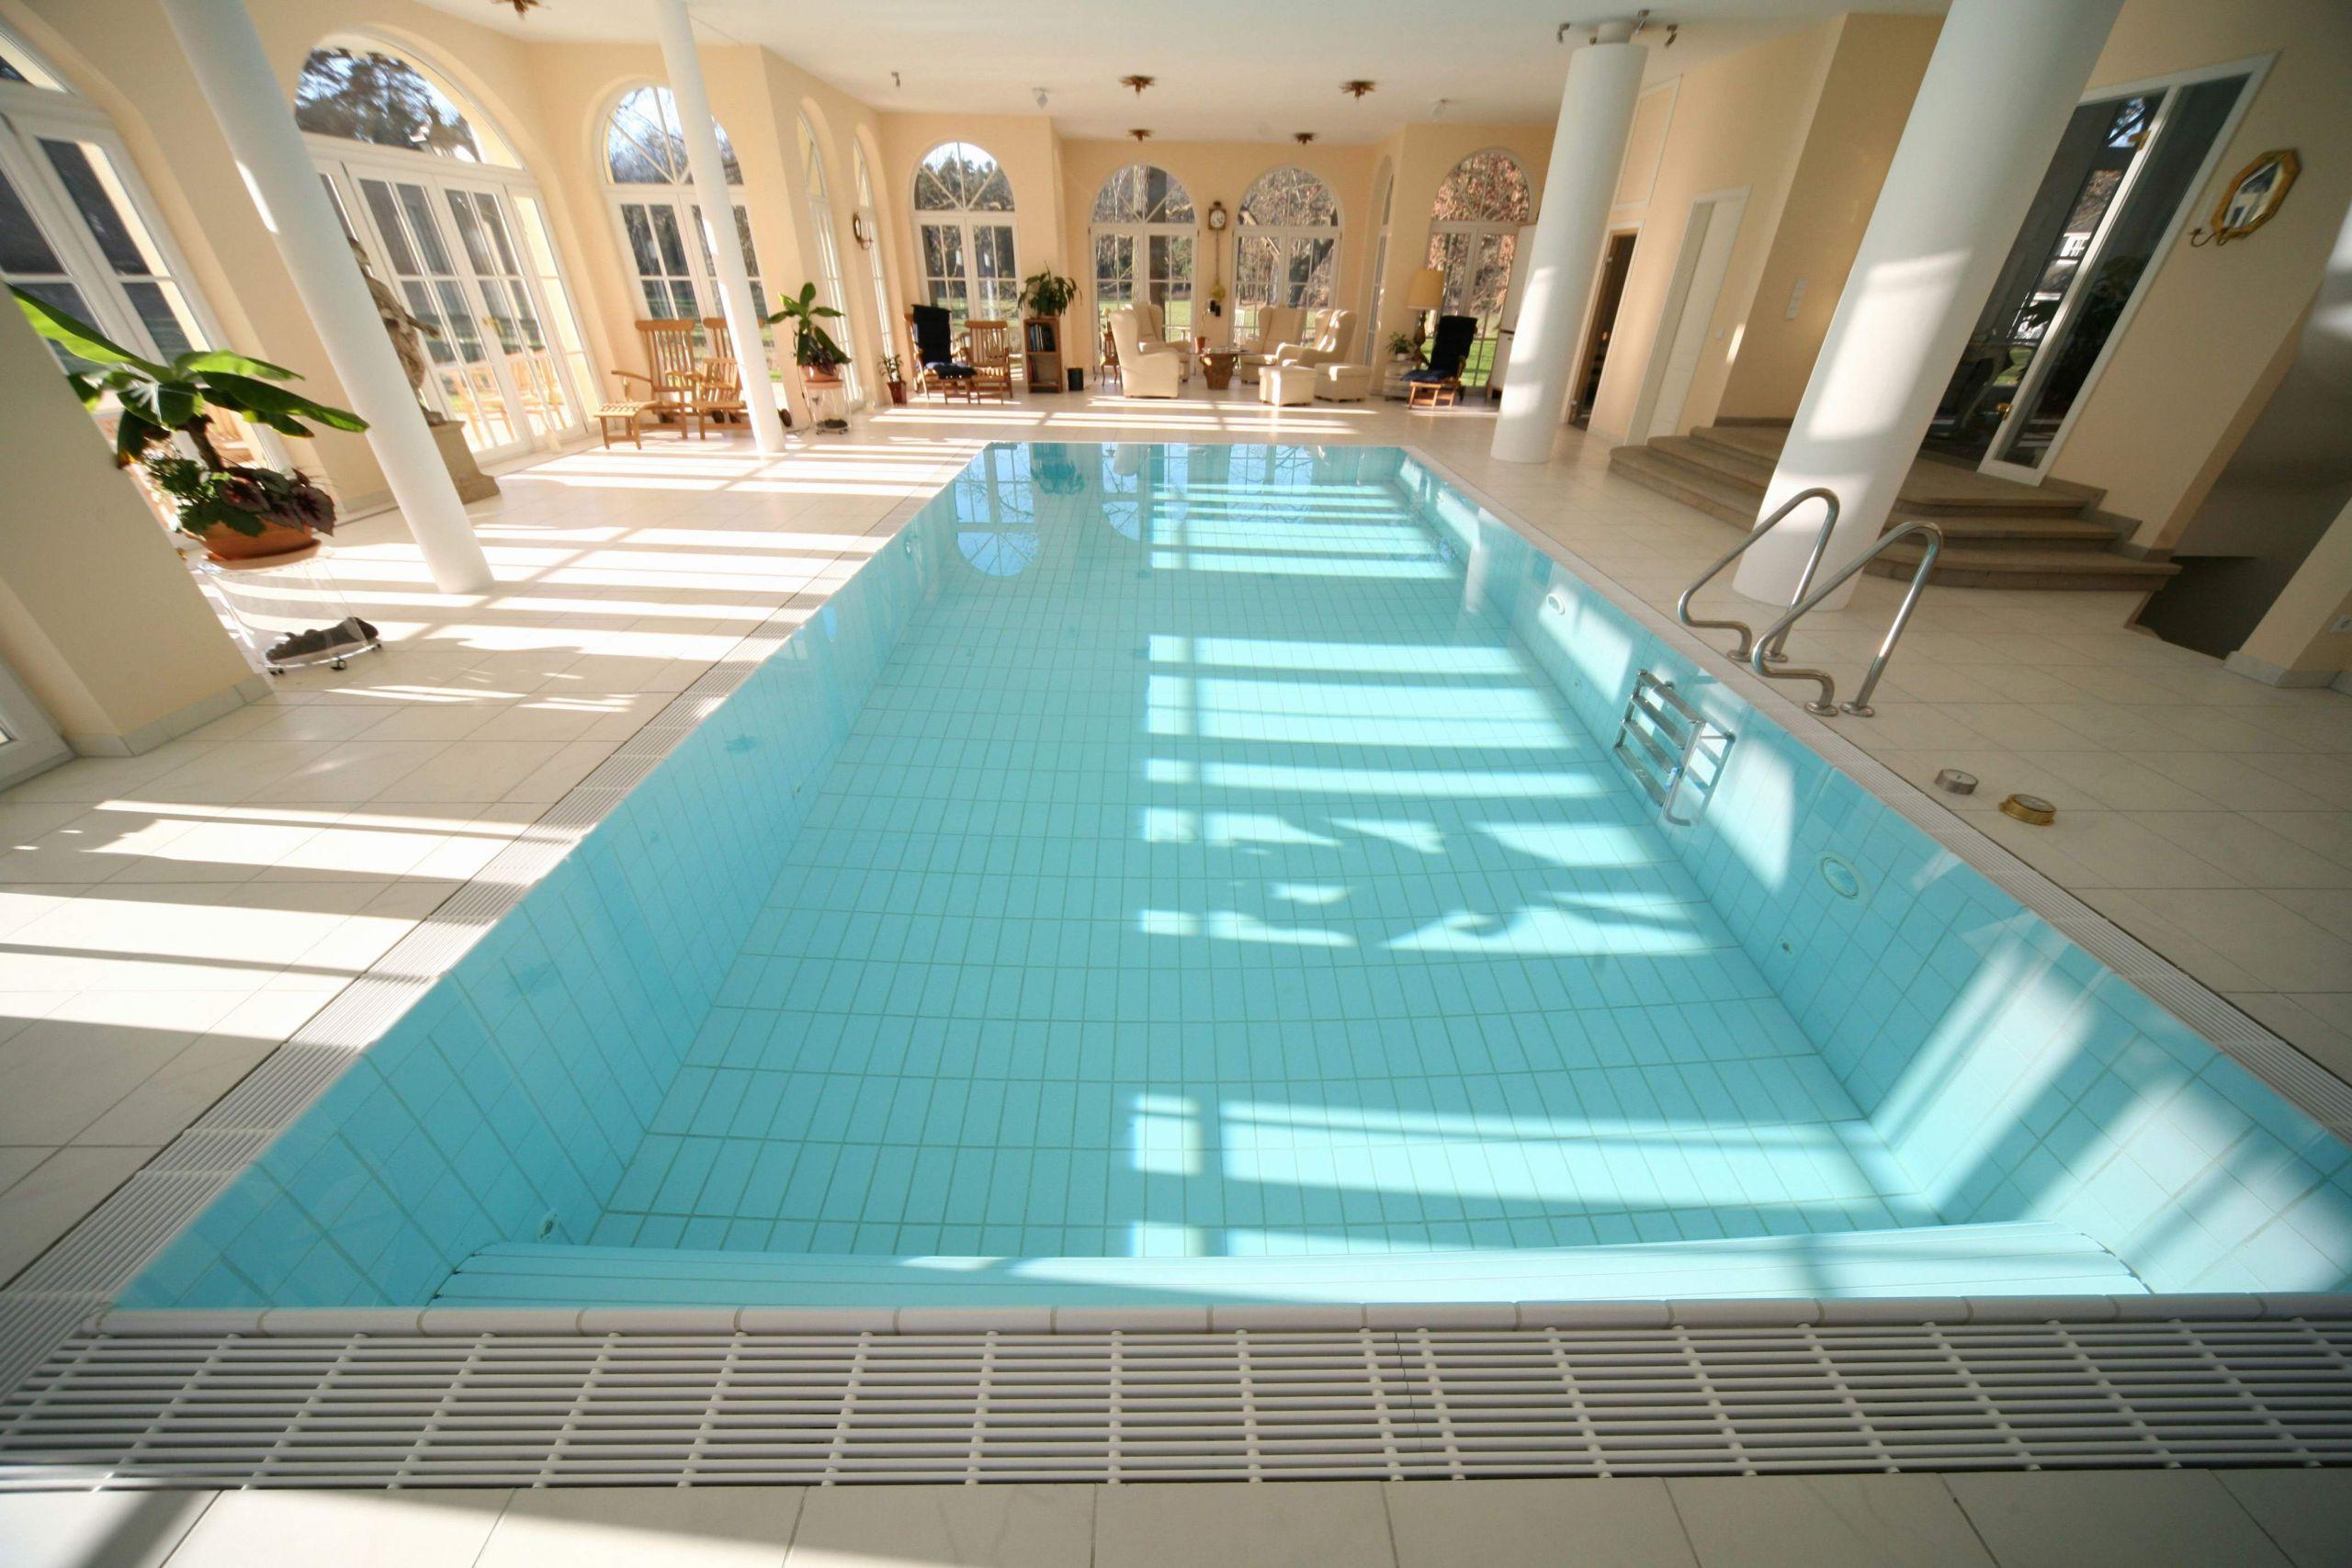 Sims 3 Design Garten Accessoires Frisch 33 Schön Swimming Pool Garten Reizend